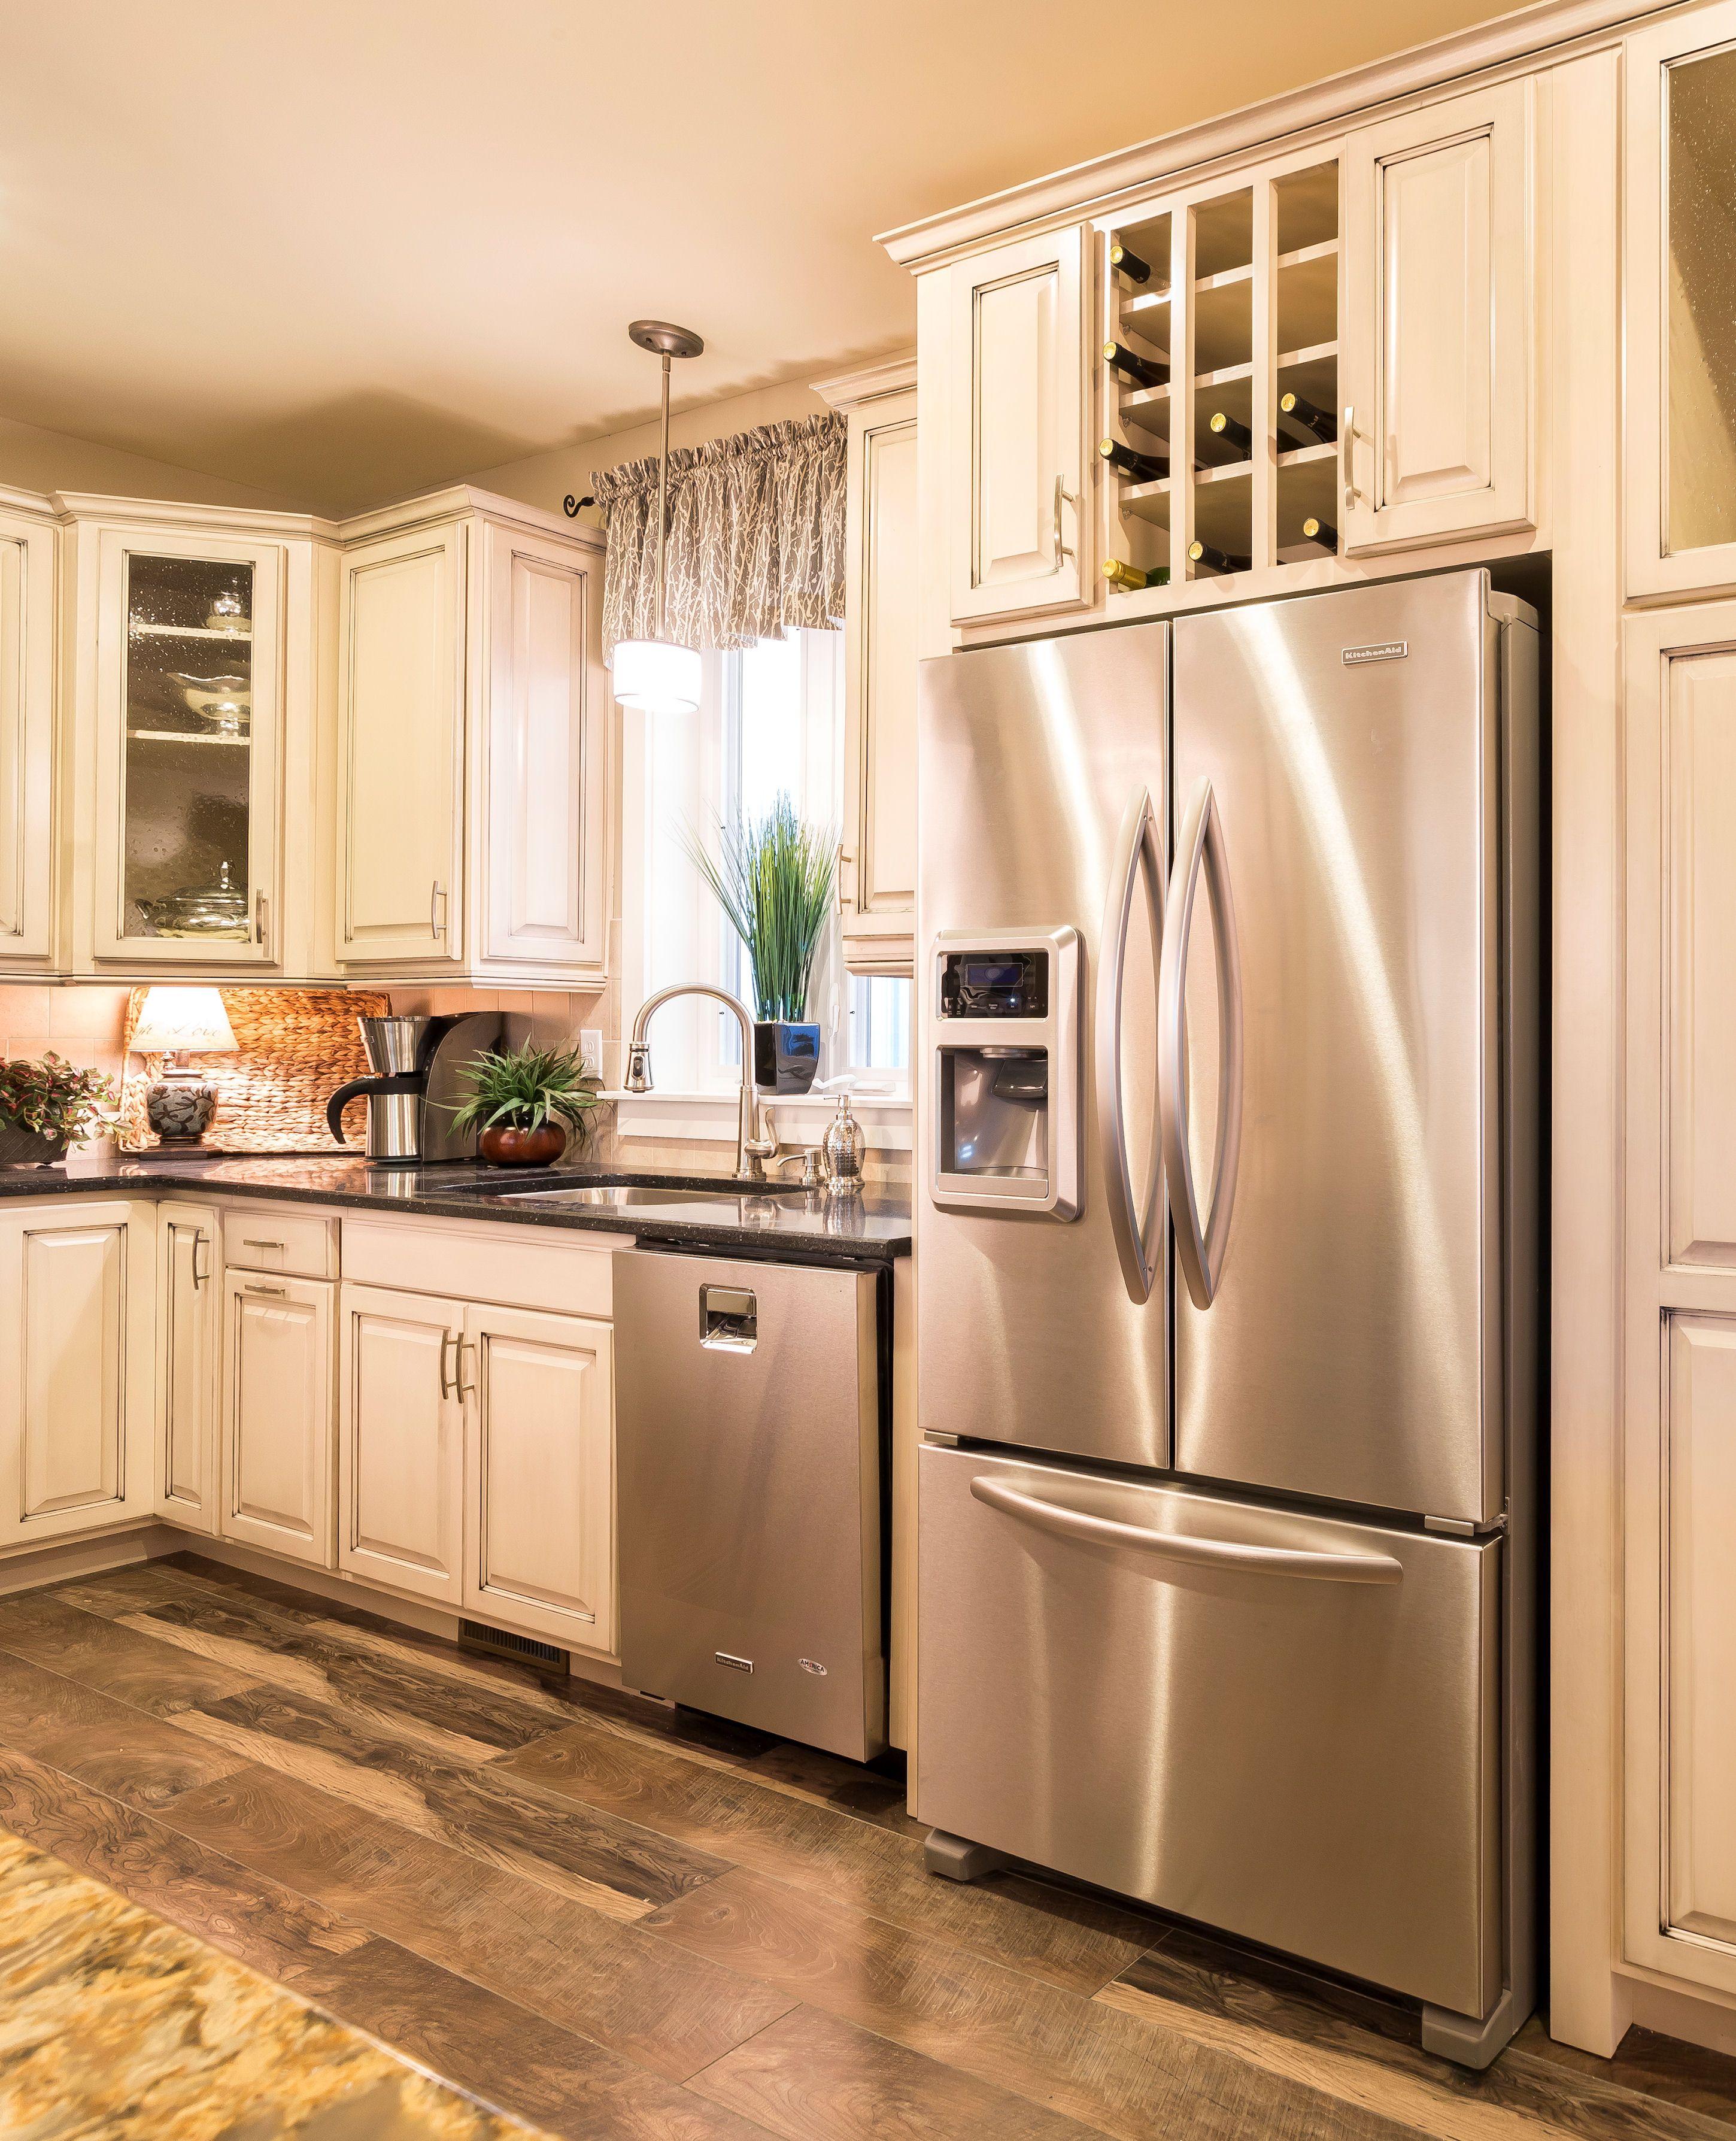 Pin By Ritz Craft Custom Homes On Your Dream Kitchen Kitchen Modular Kitchen Remodel Home Kitchens